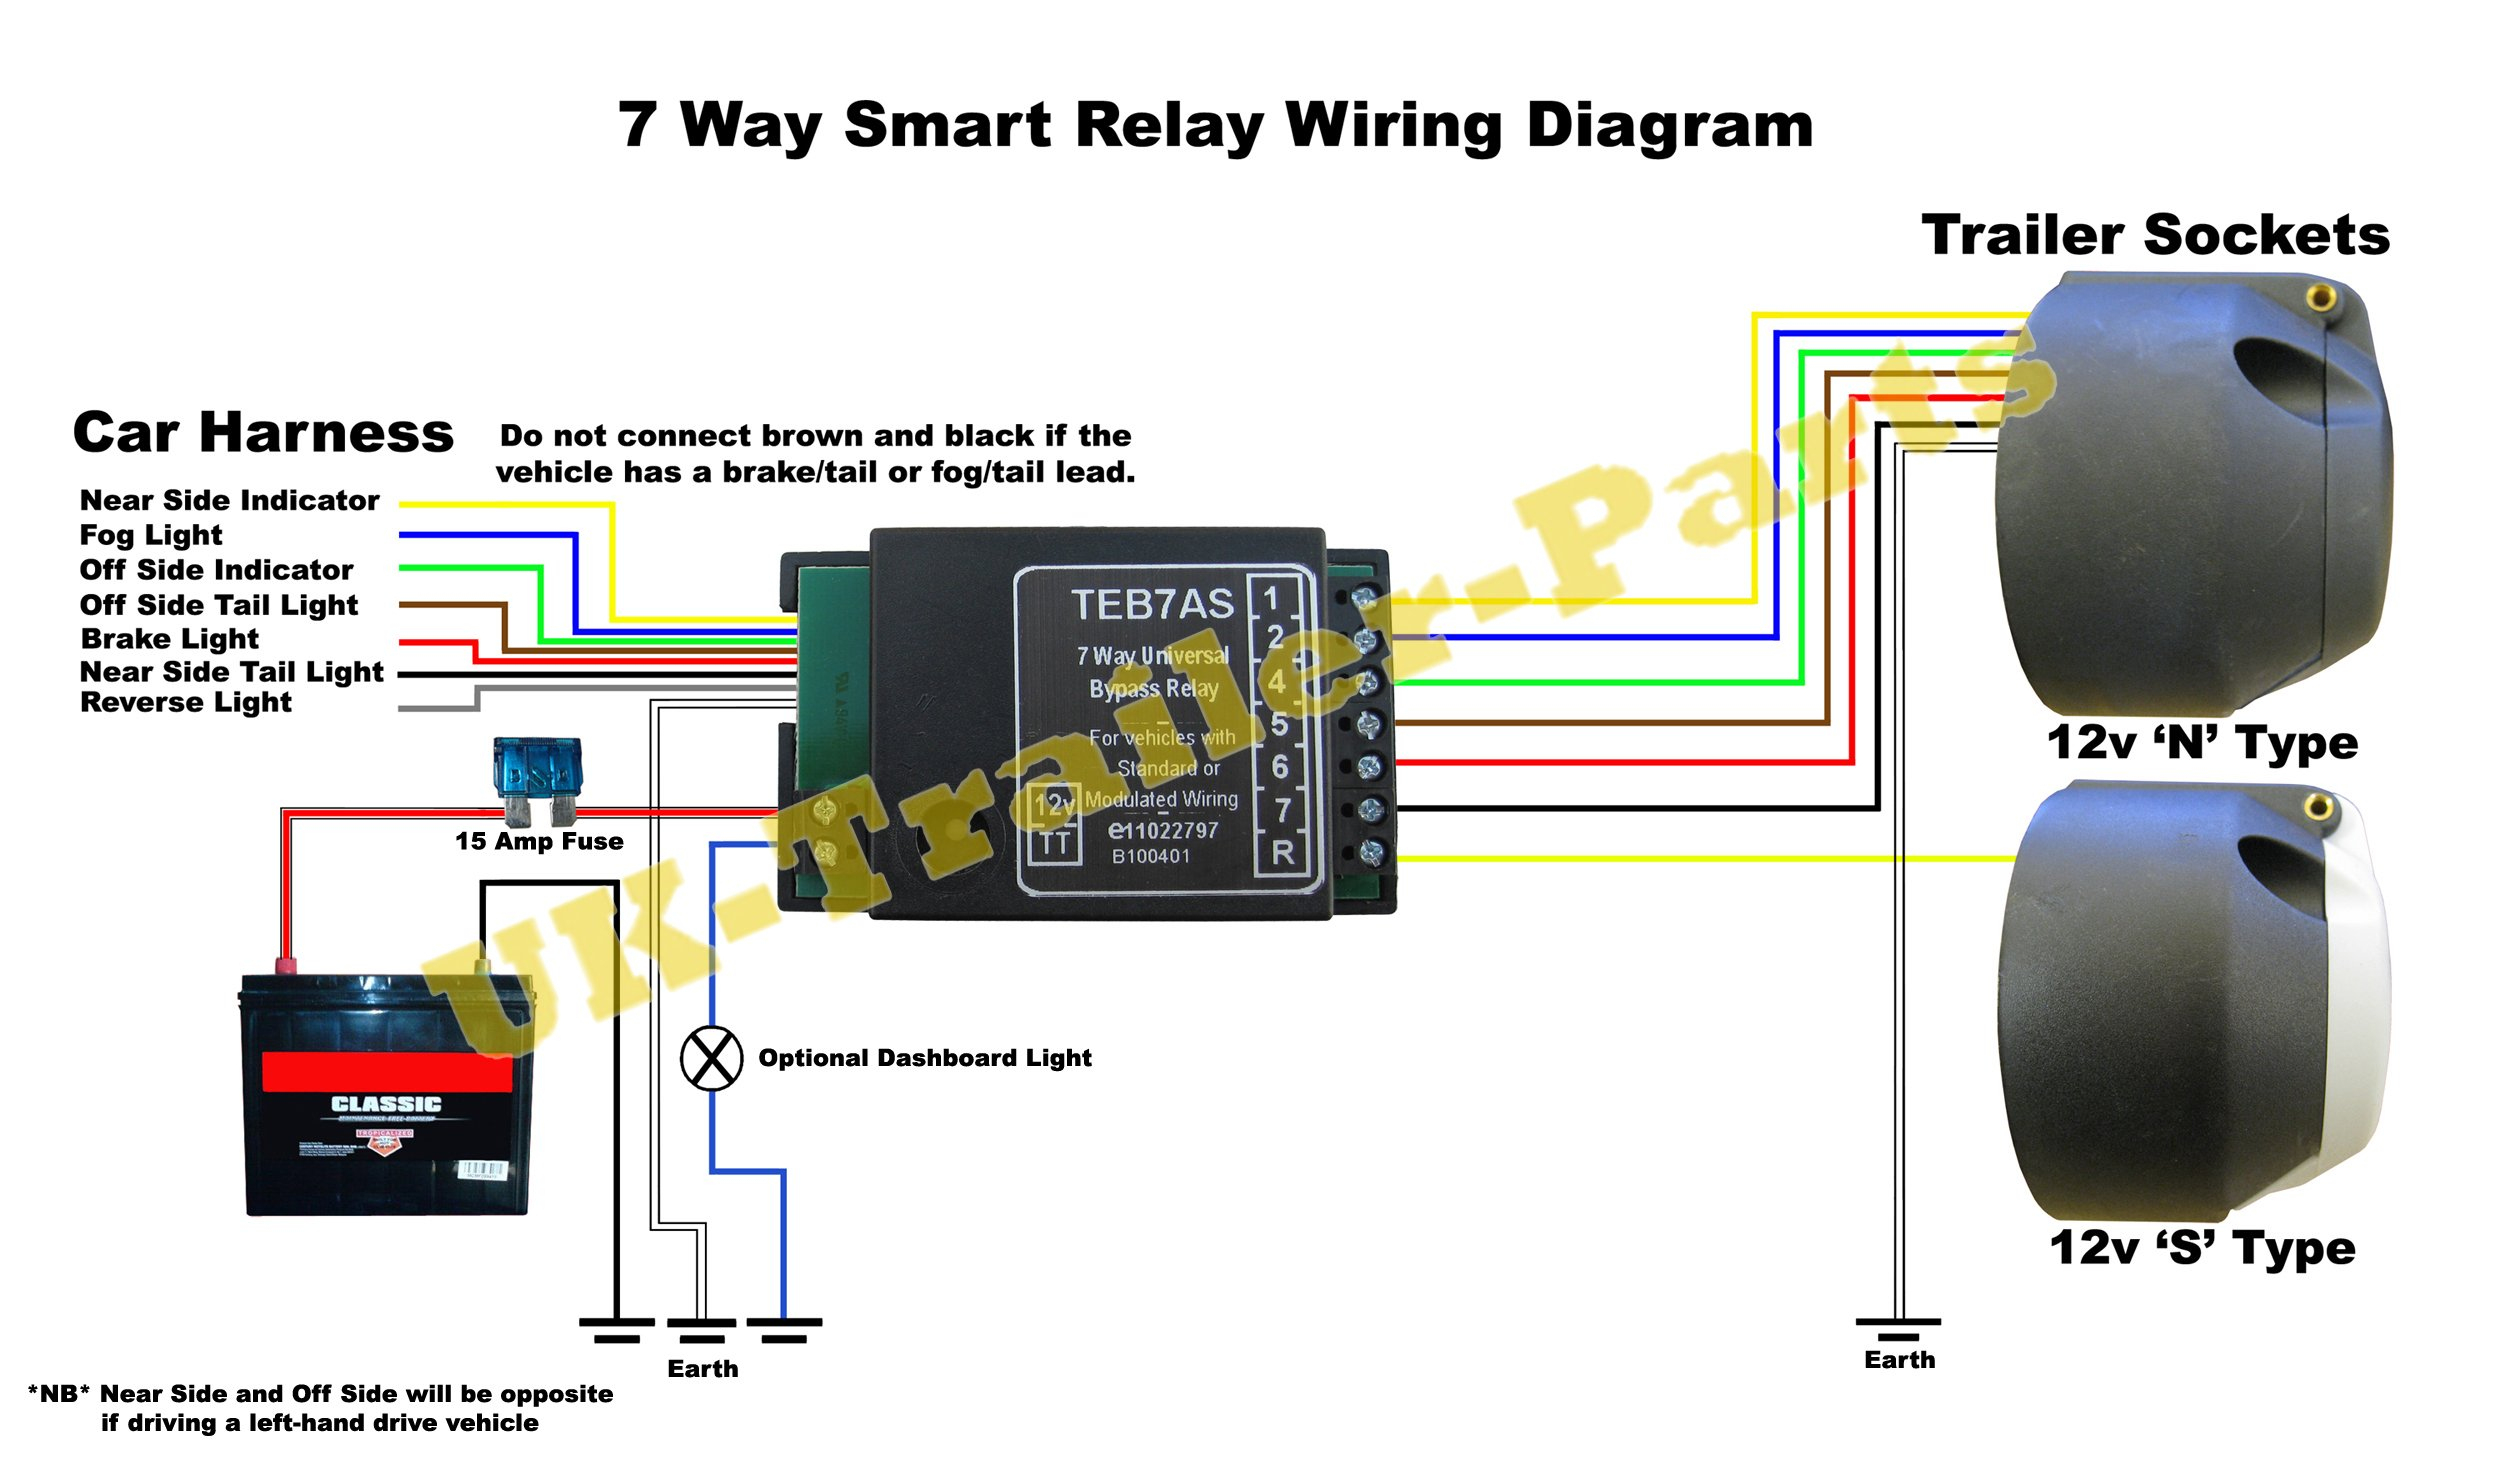 7 Way Universal Bypass Relay Wiring Diagram | Uk-Trailer-Parts - 7 Wire Trailer Wiring Diagram